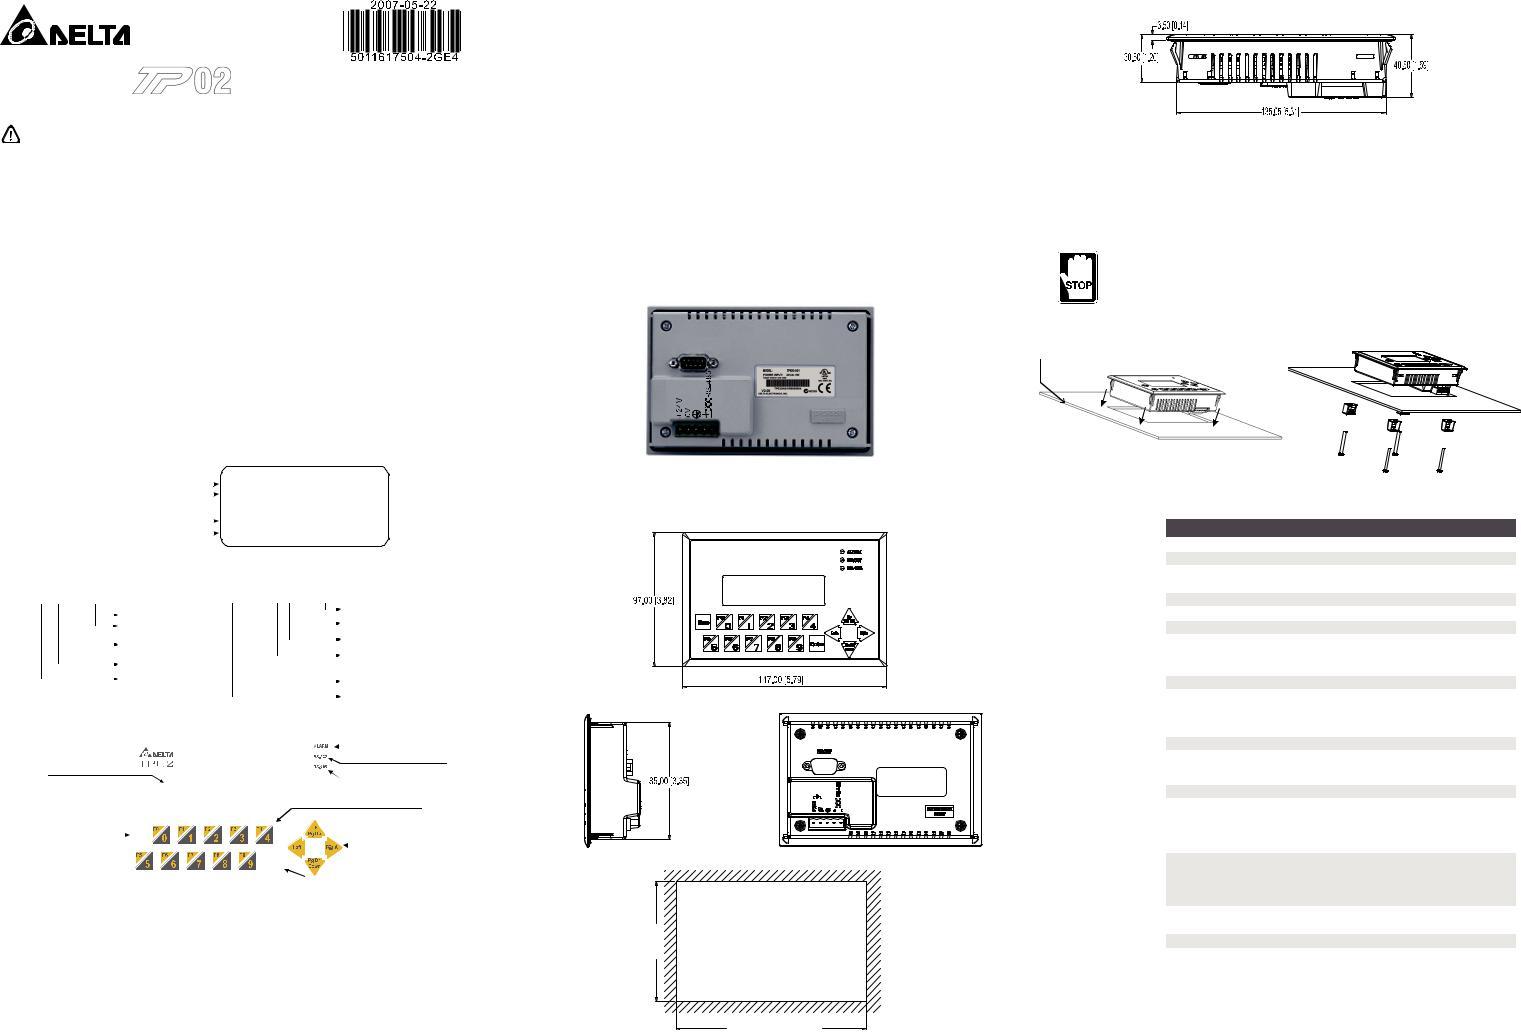 [DIAGRAM_38IU]  Delta Electronics TP02G-AS1 User Manual | Delta Tachometer Wiring |  | ManualMachine.com